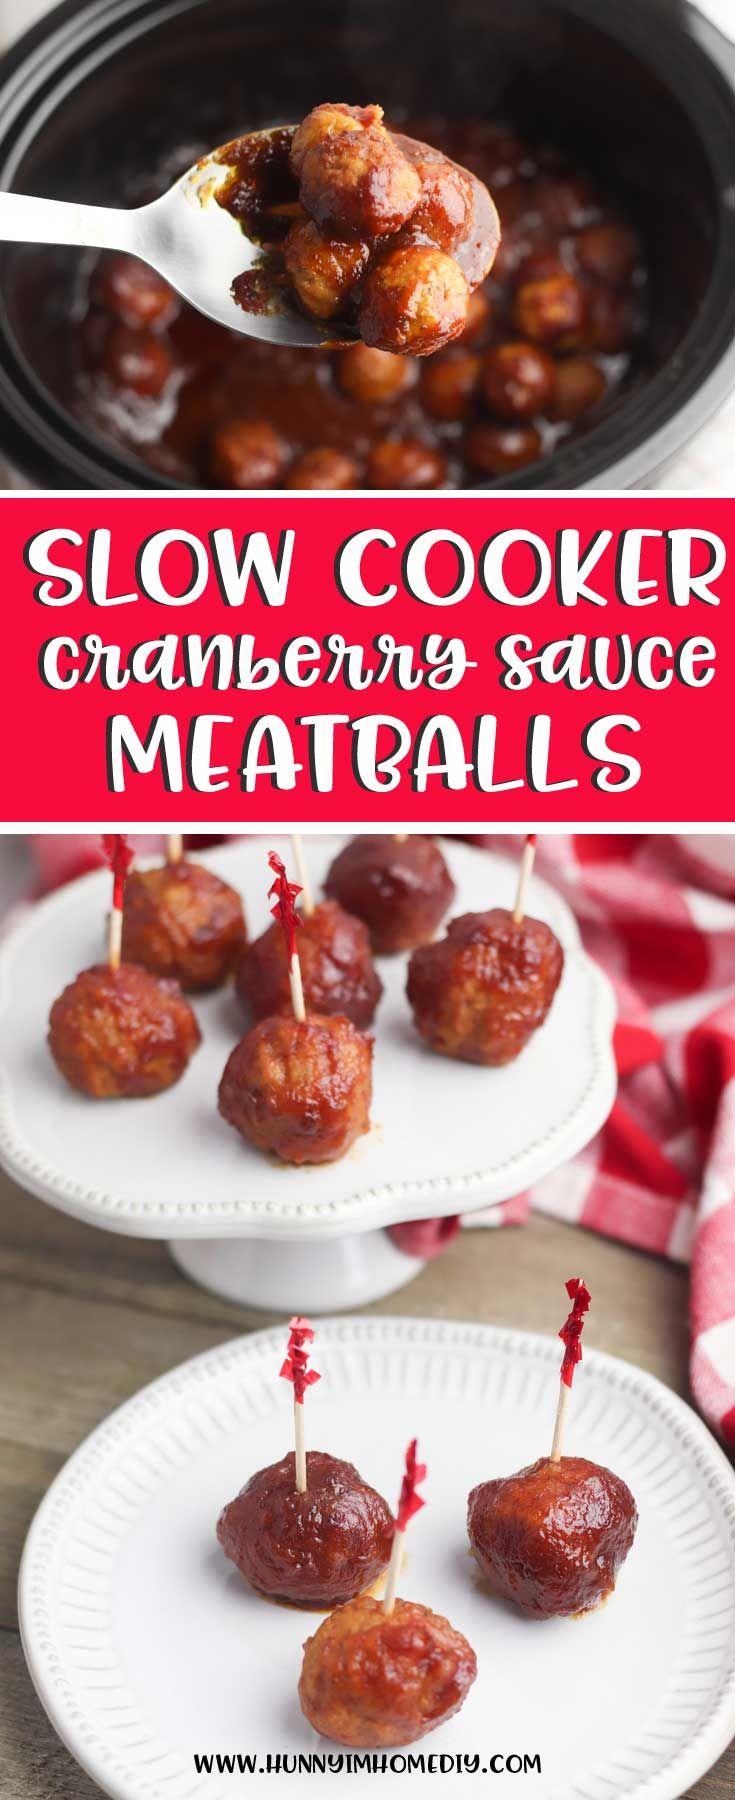 Simple Three-Ingredient Cranberry Sauce Meatballs #gamedayfood